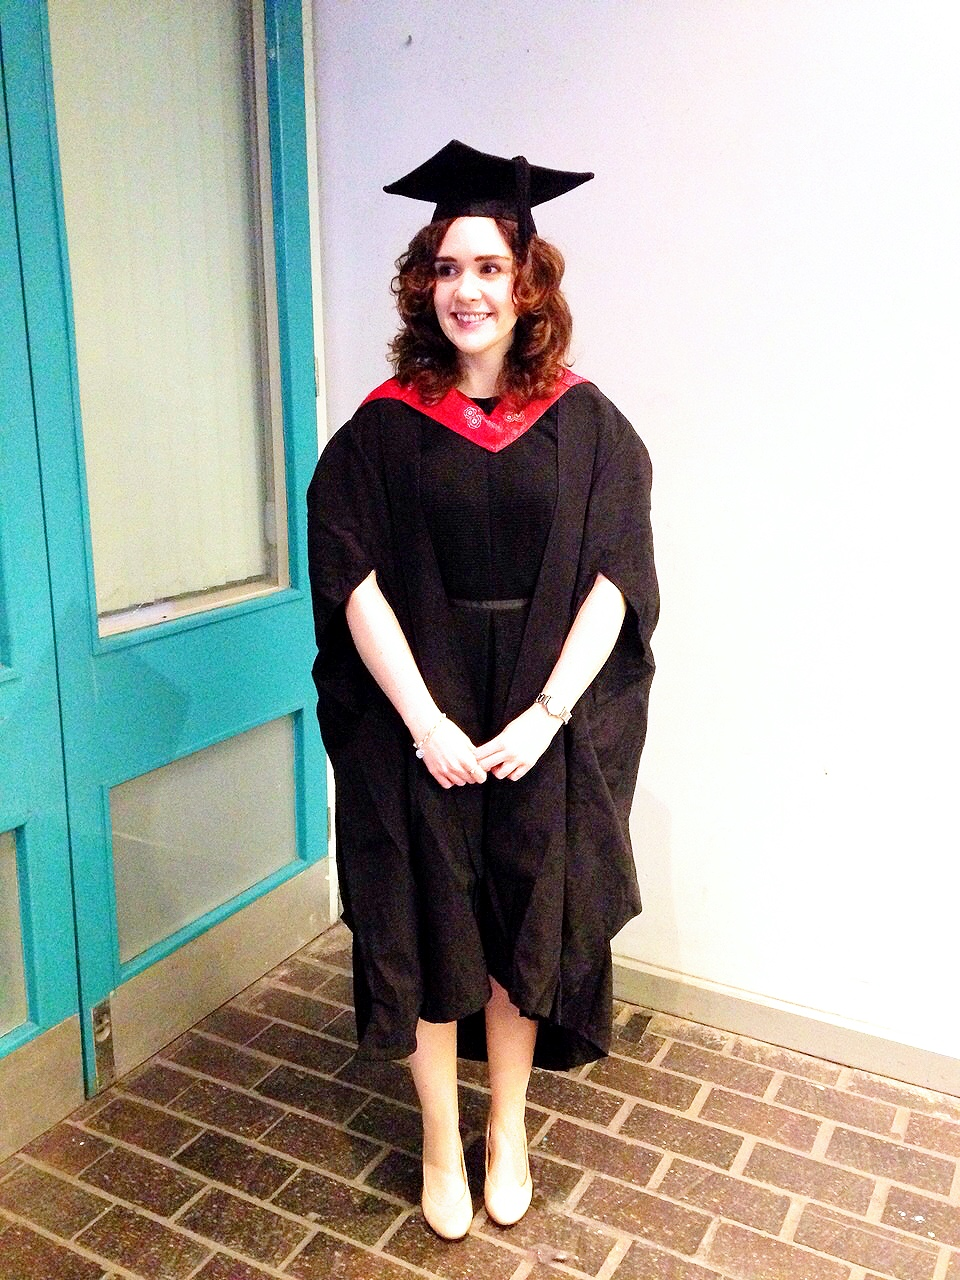 lost as graduate